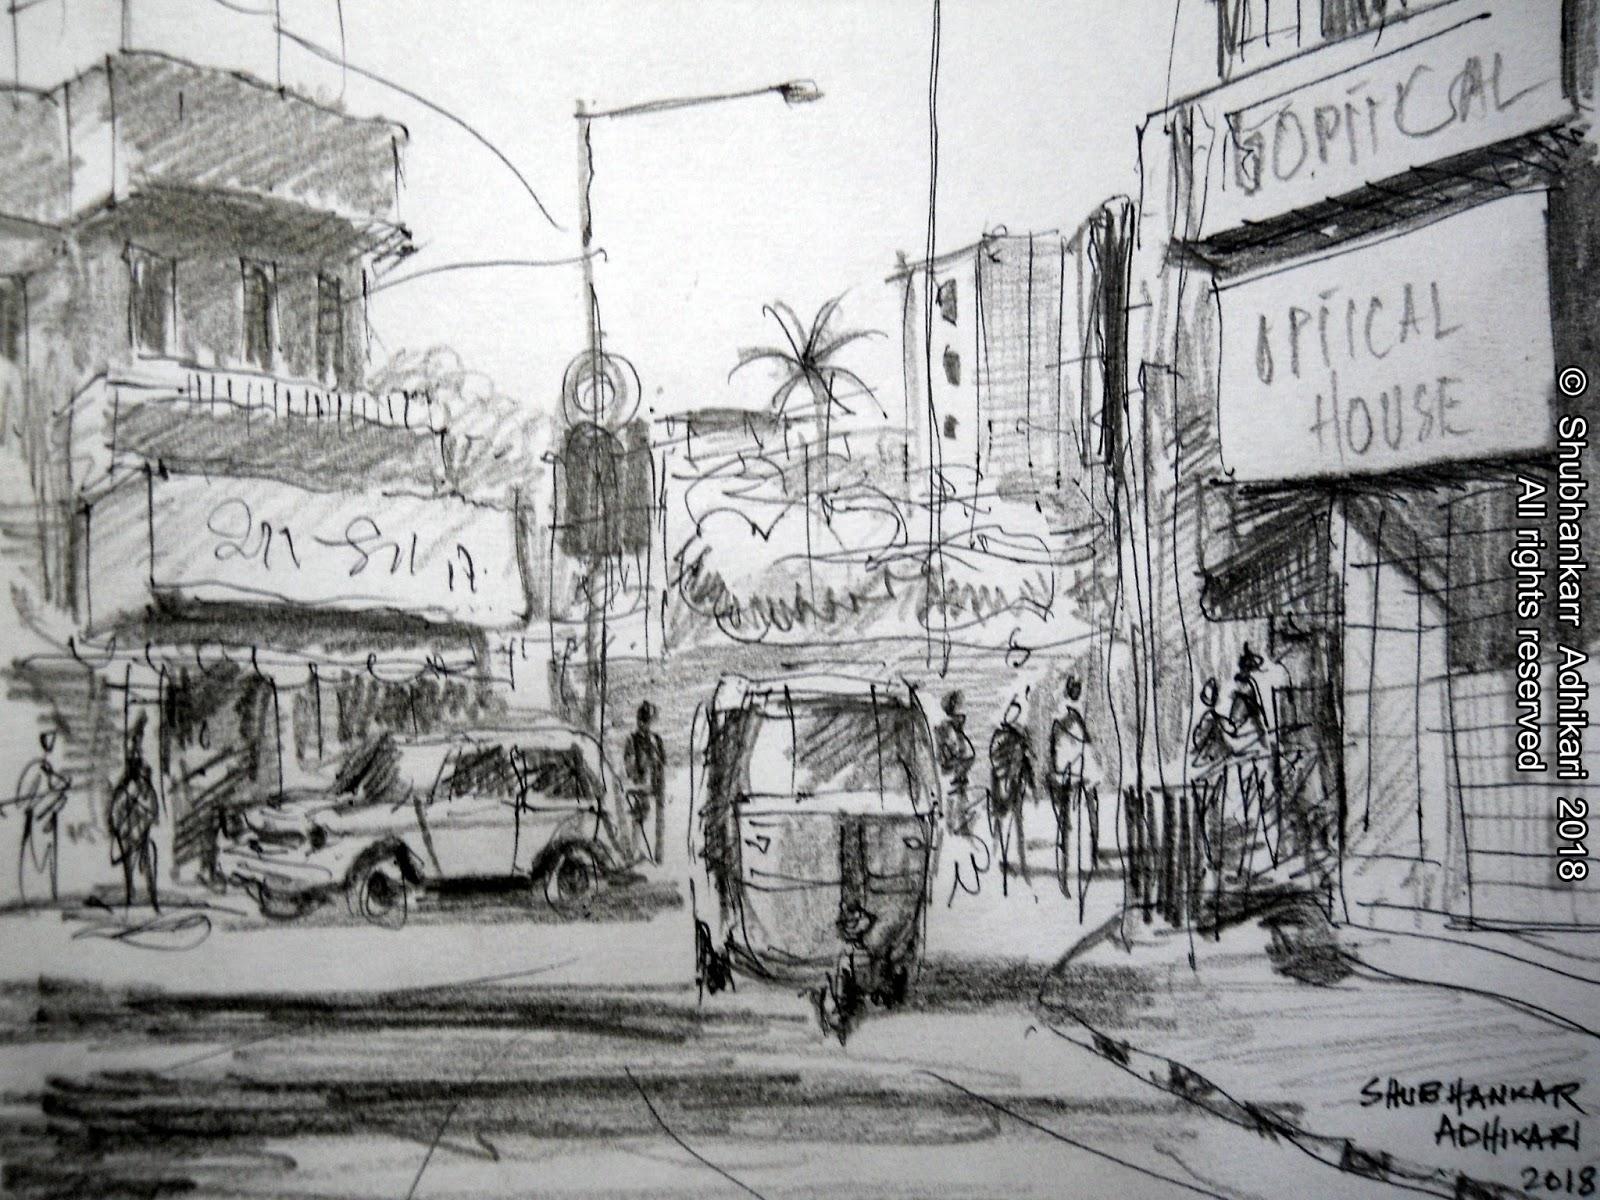 Shubhankar adhikari fine art speed sketch with pen pencil